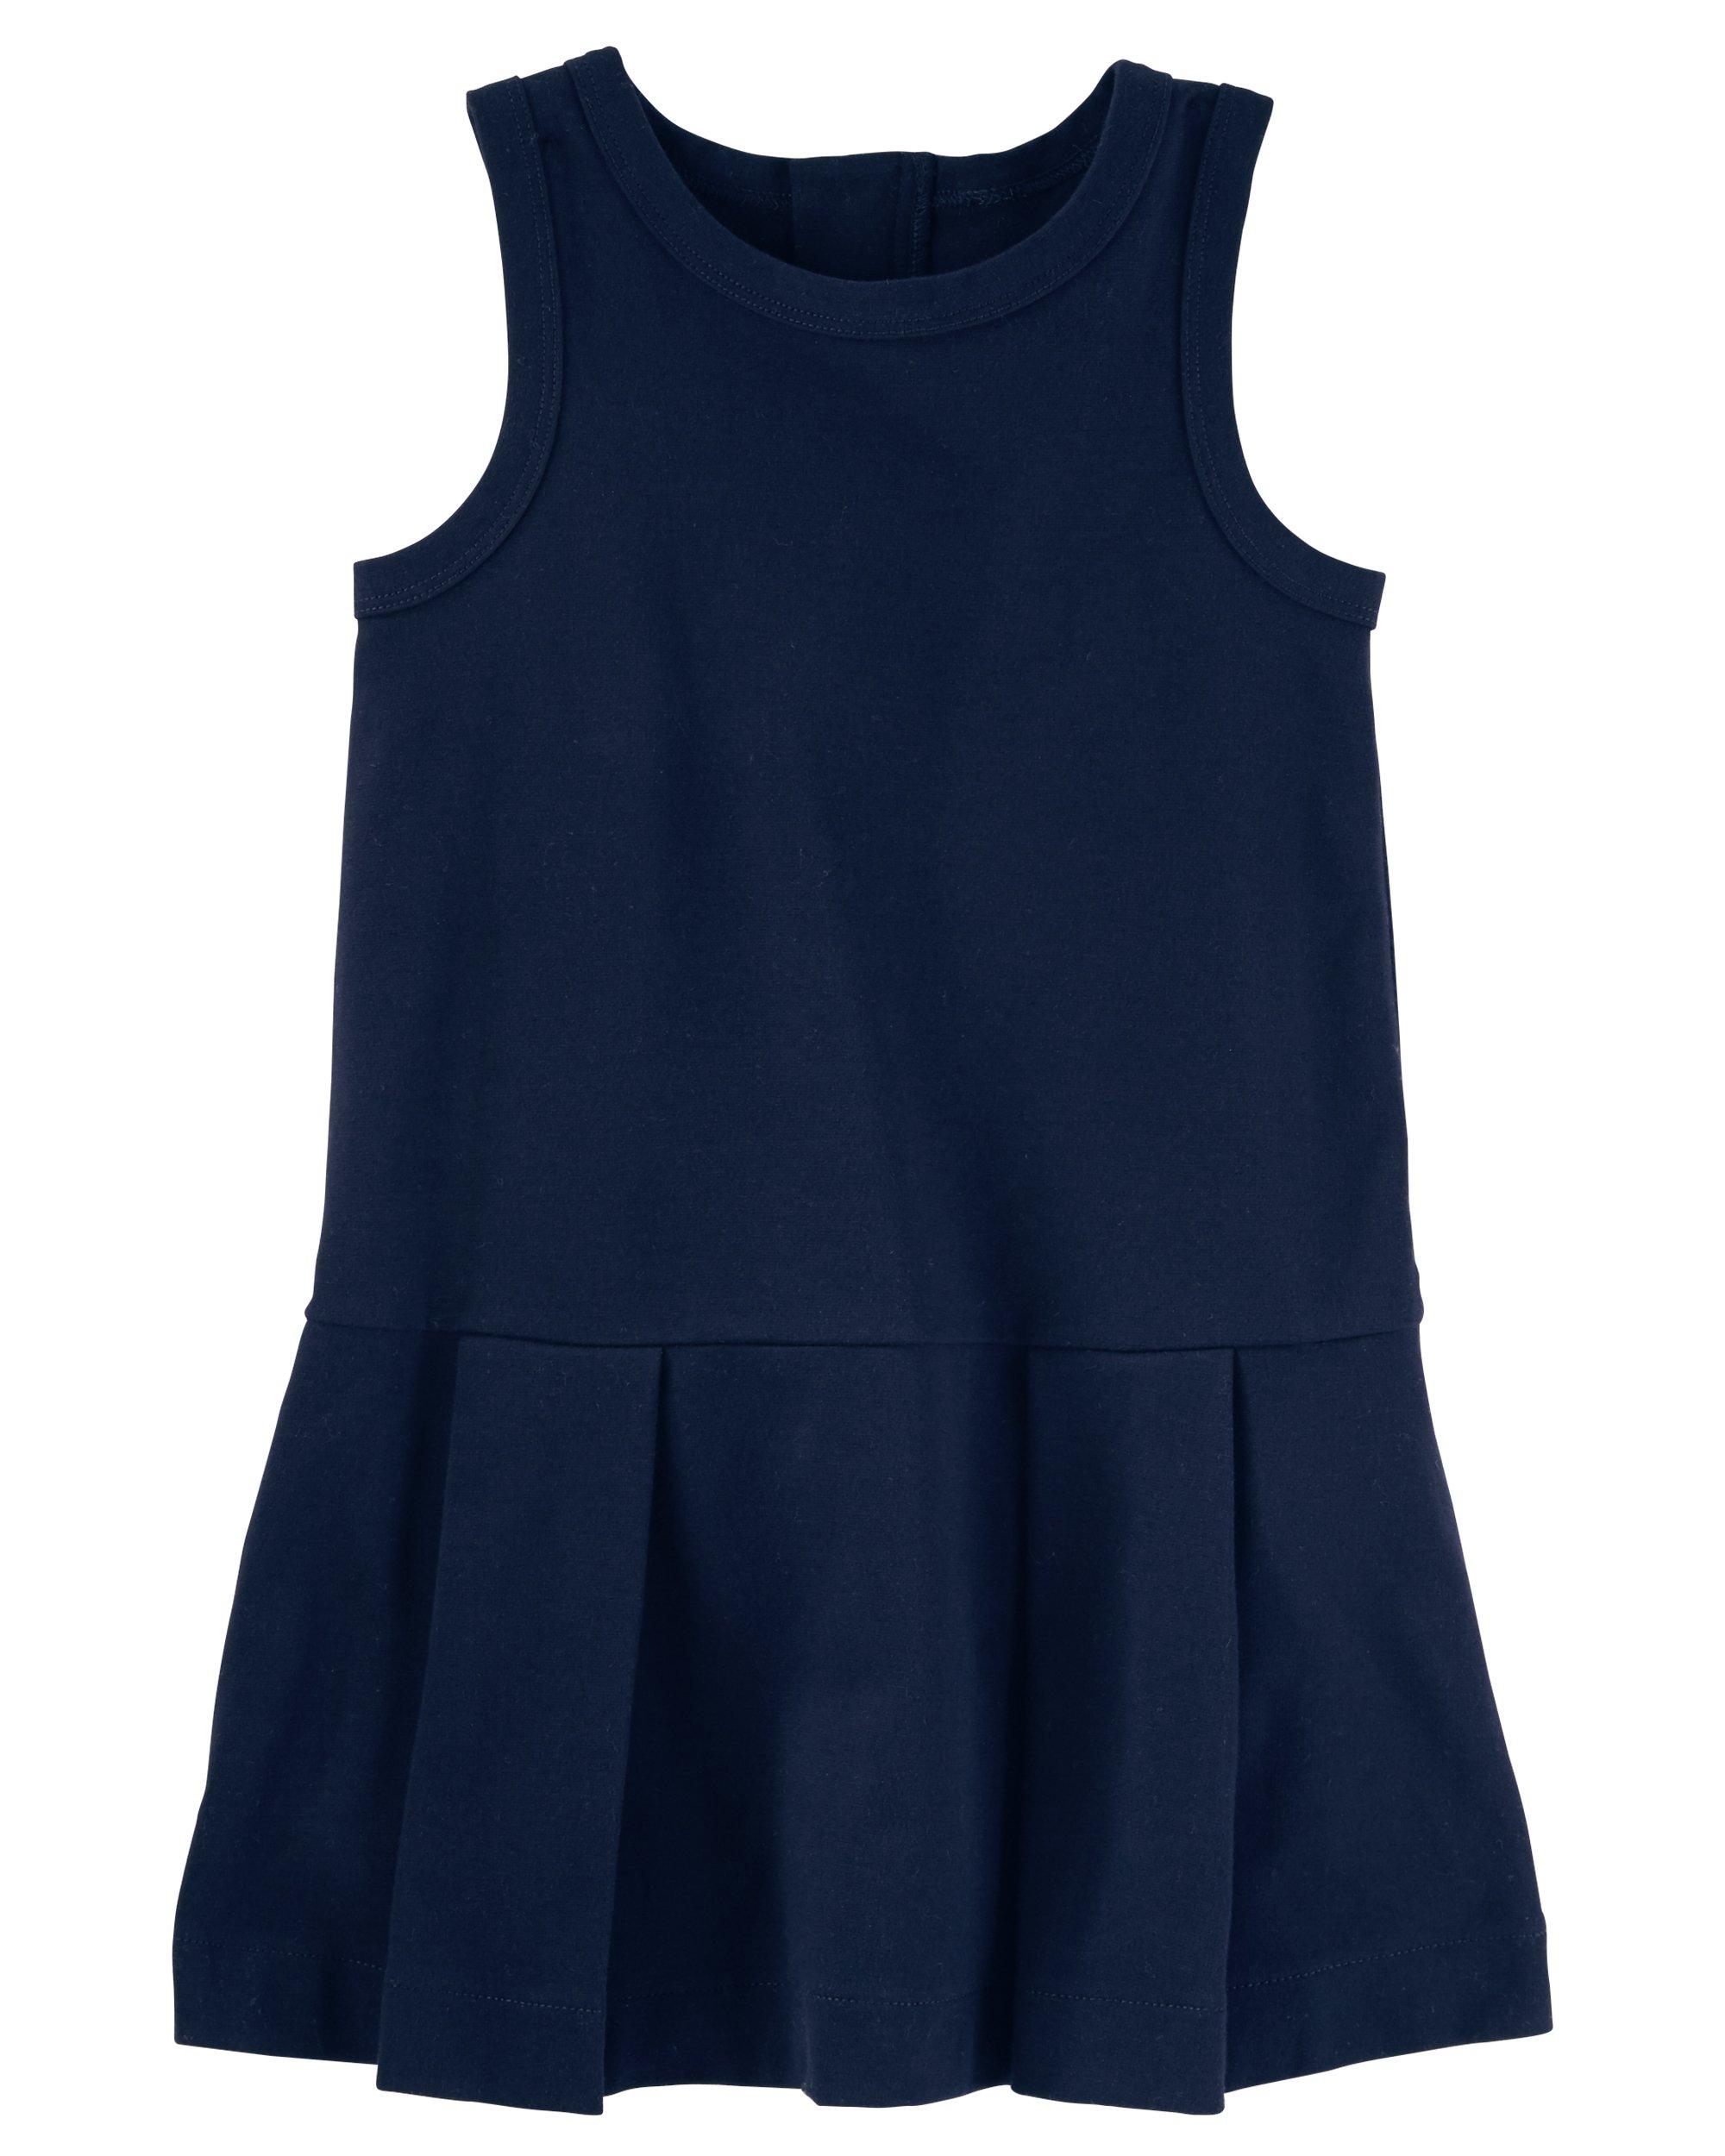 Osh Kosh Girls' Kids Uniform Jumper, Navy, 7